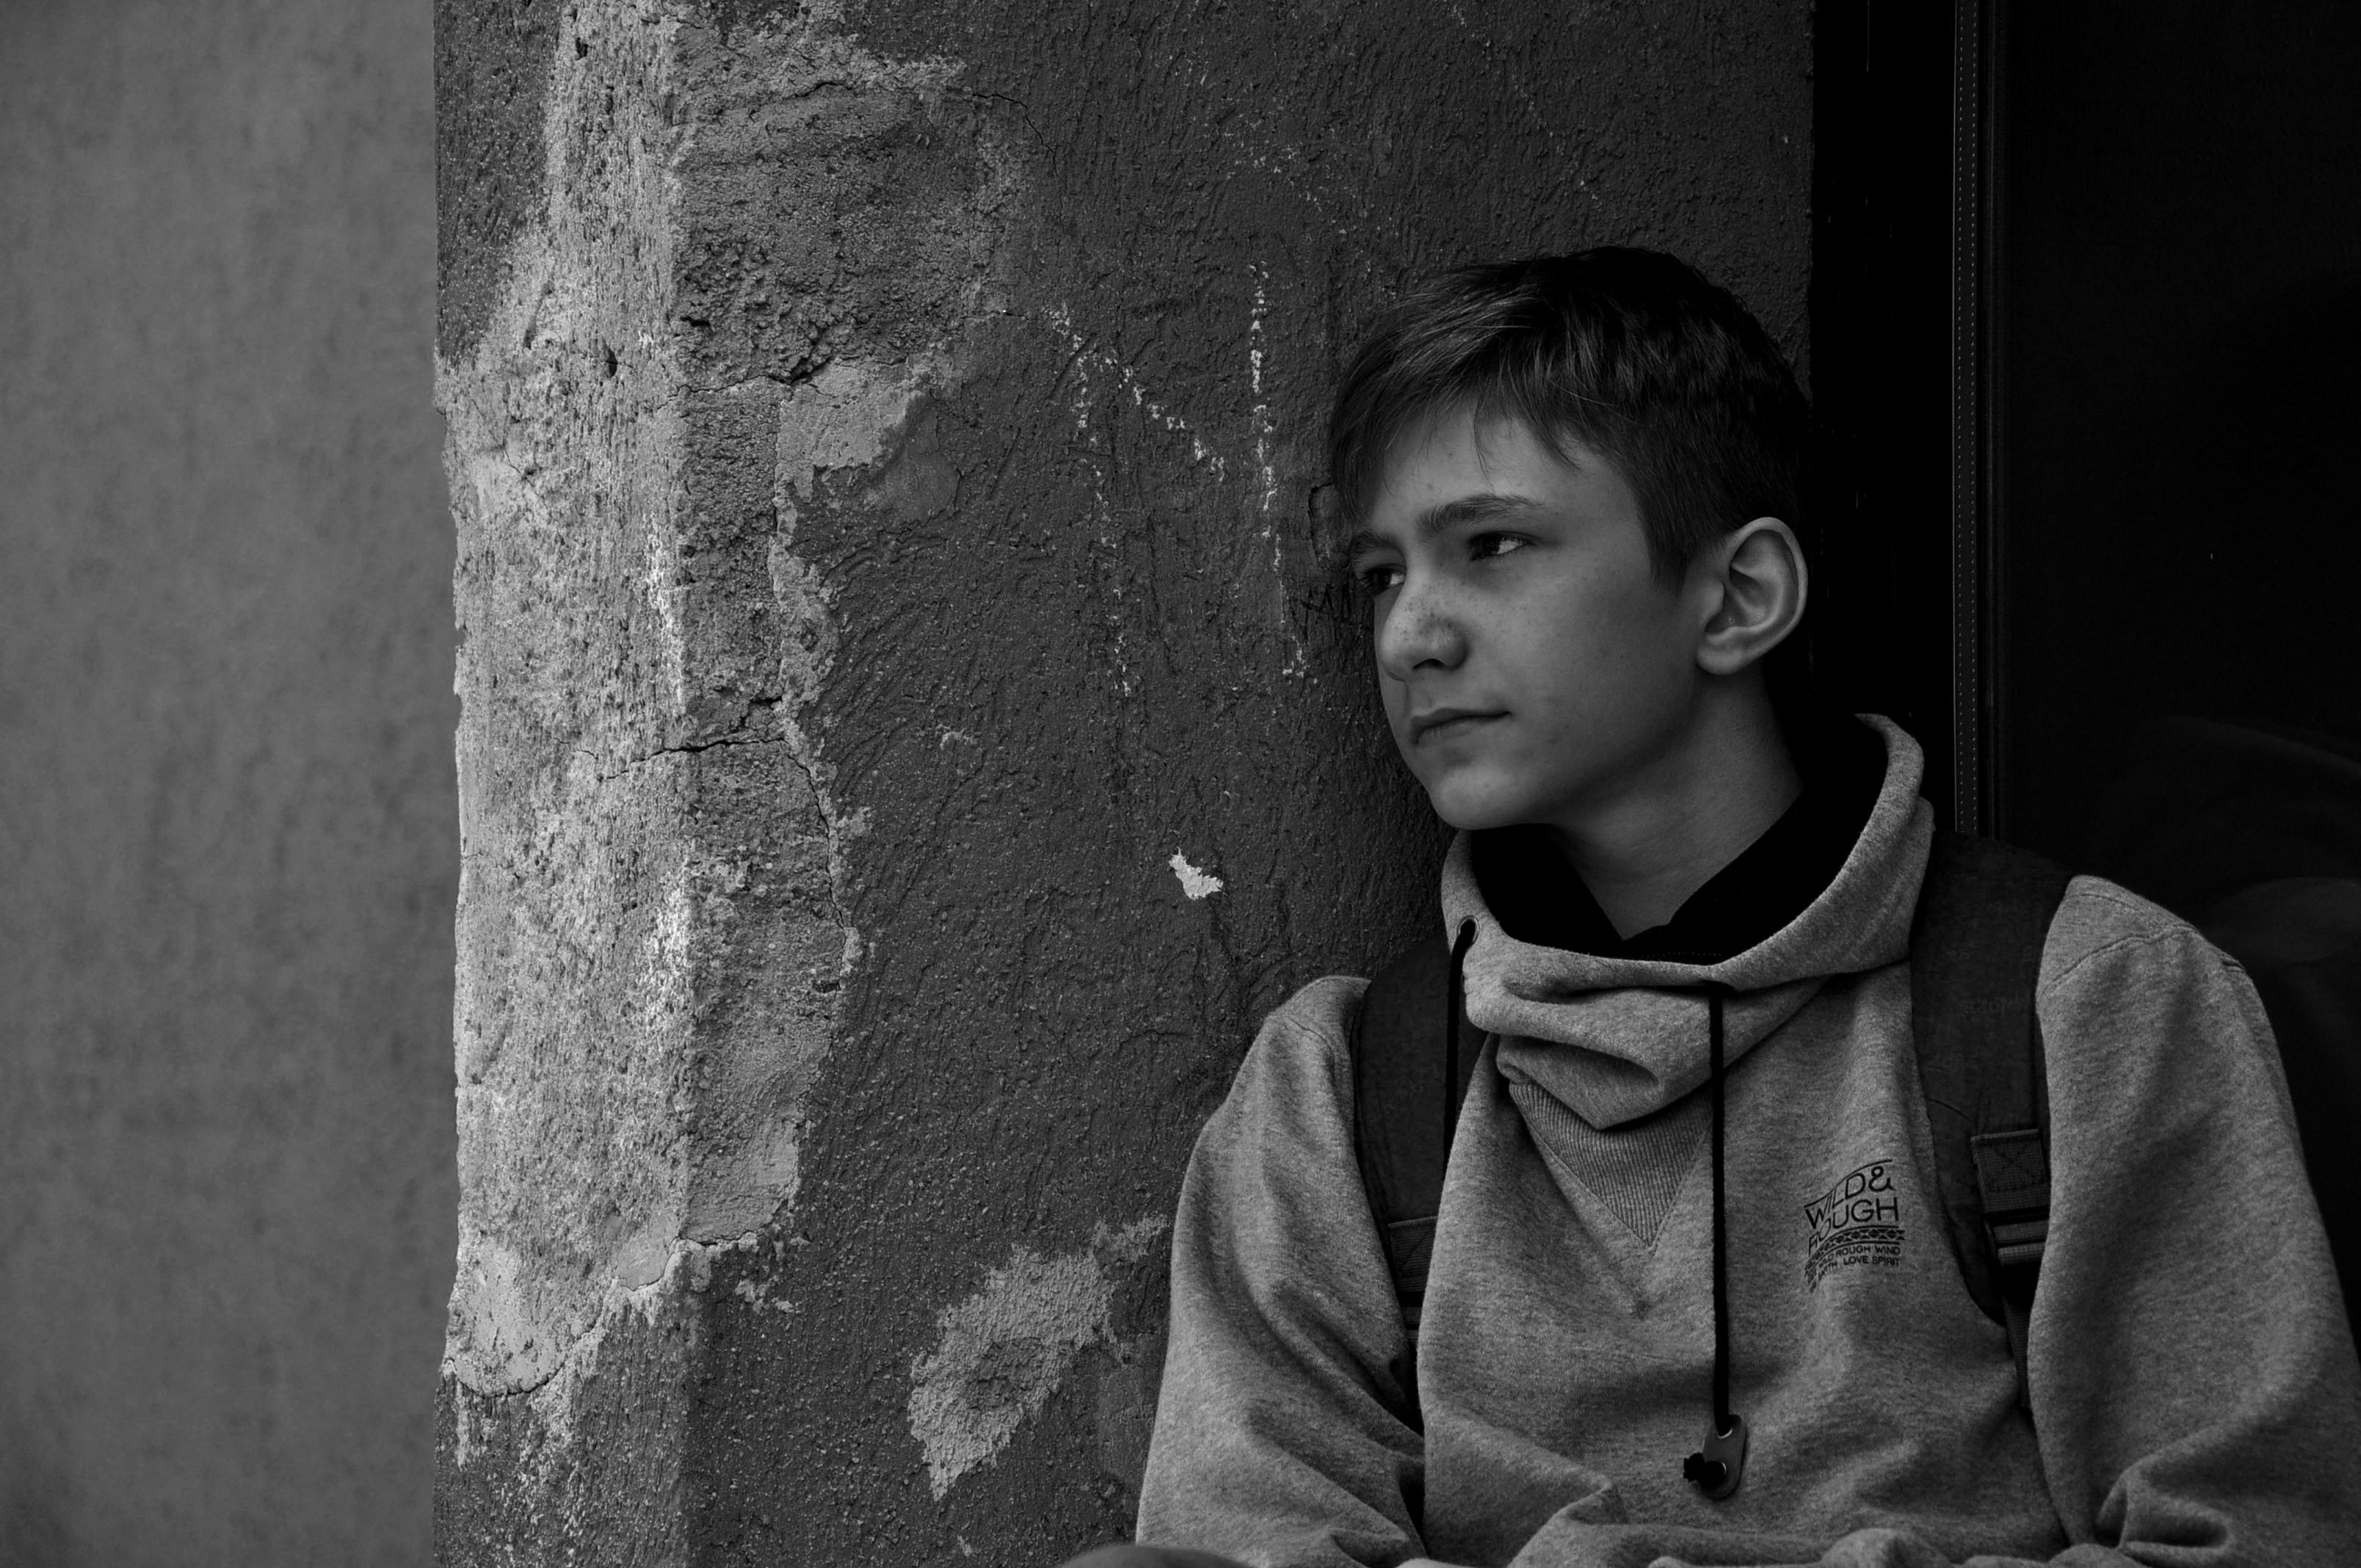 Portrait black & white photography.